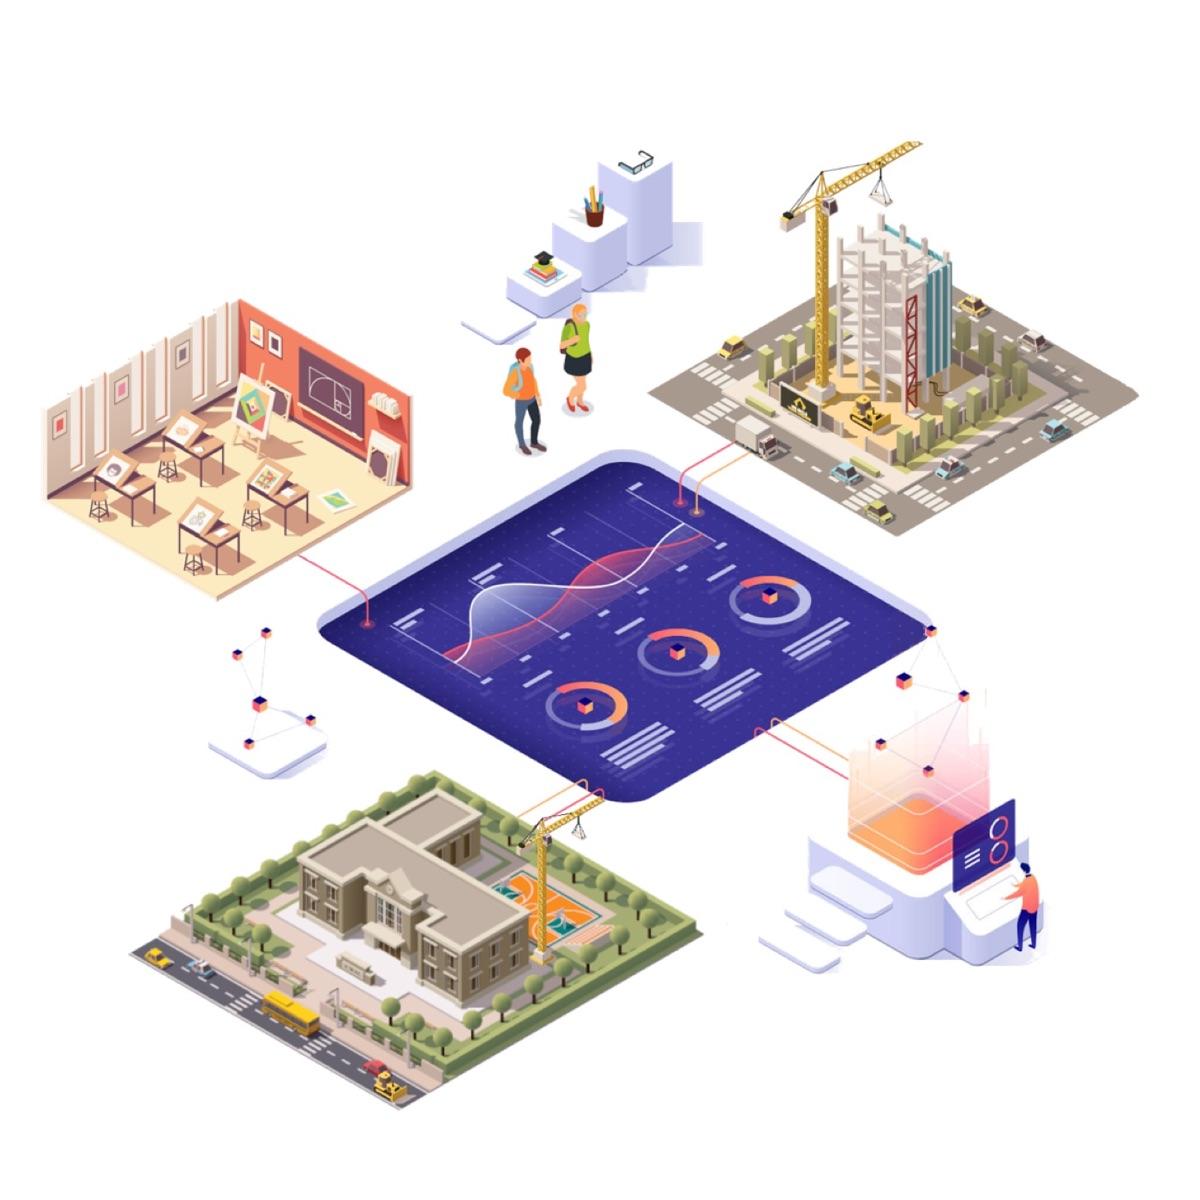 Constructing Education in a Digital World